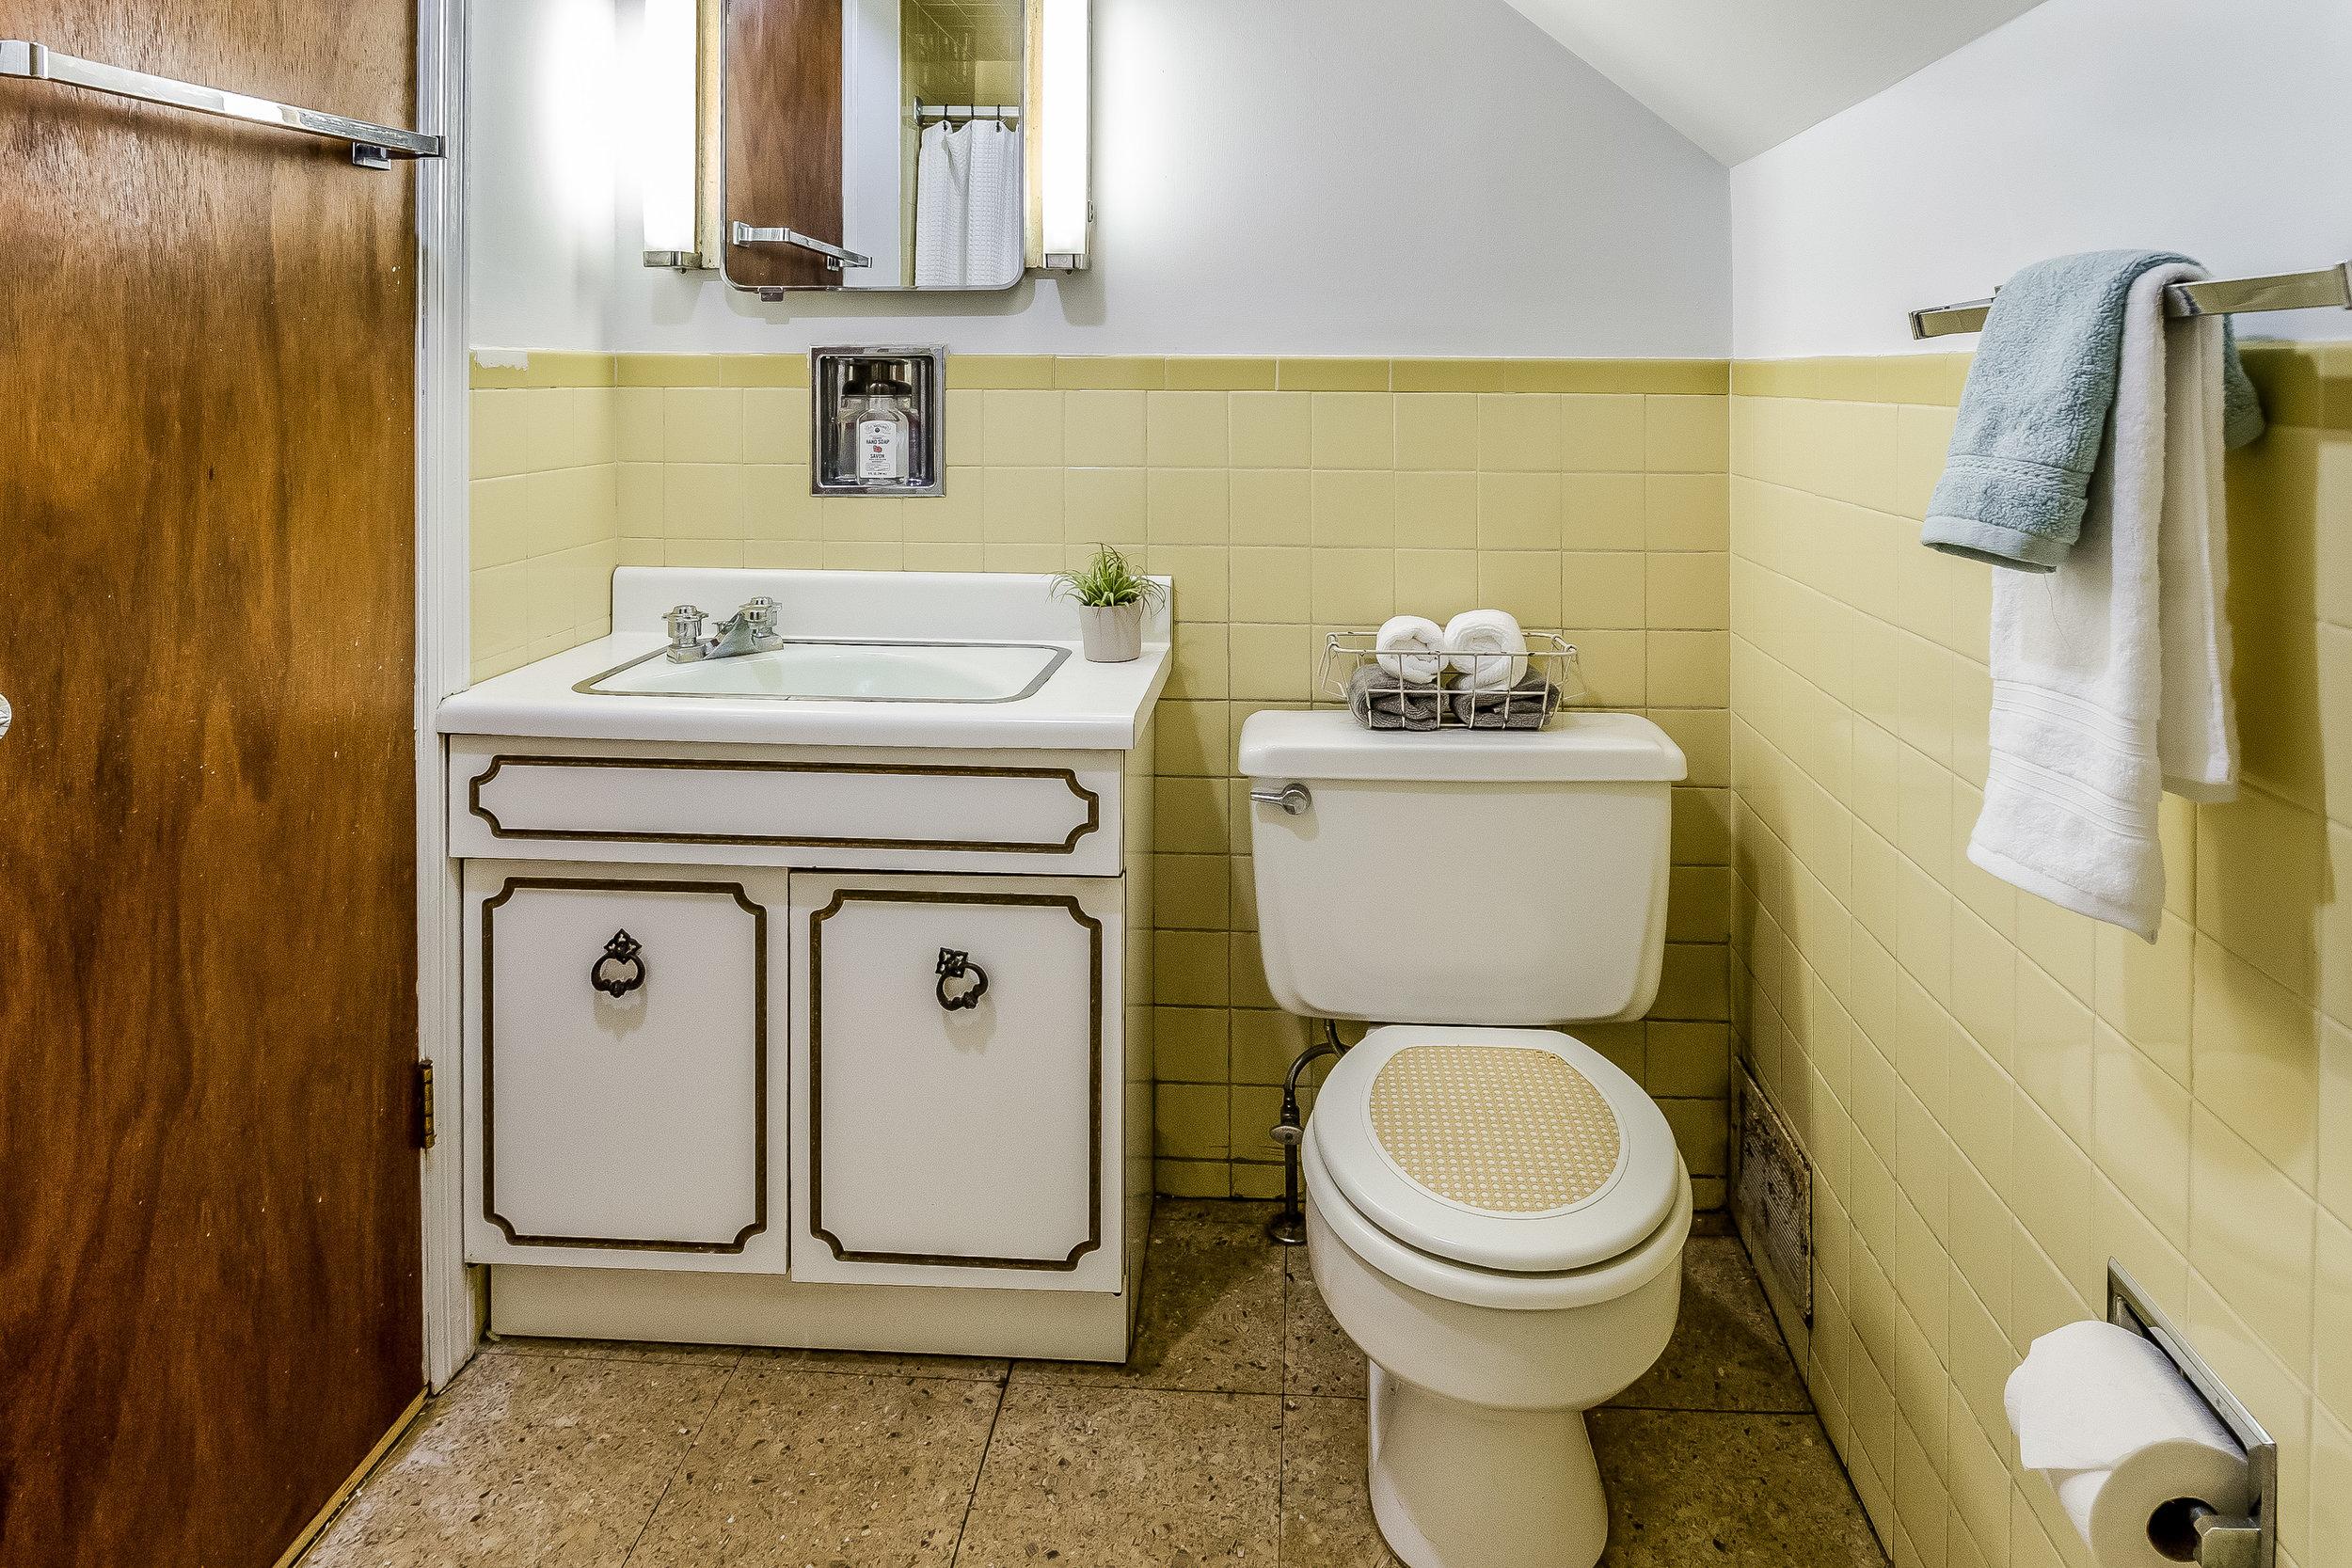 032-photo-bathroom-5786567.jpg